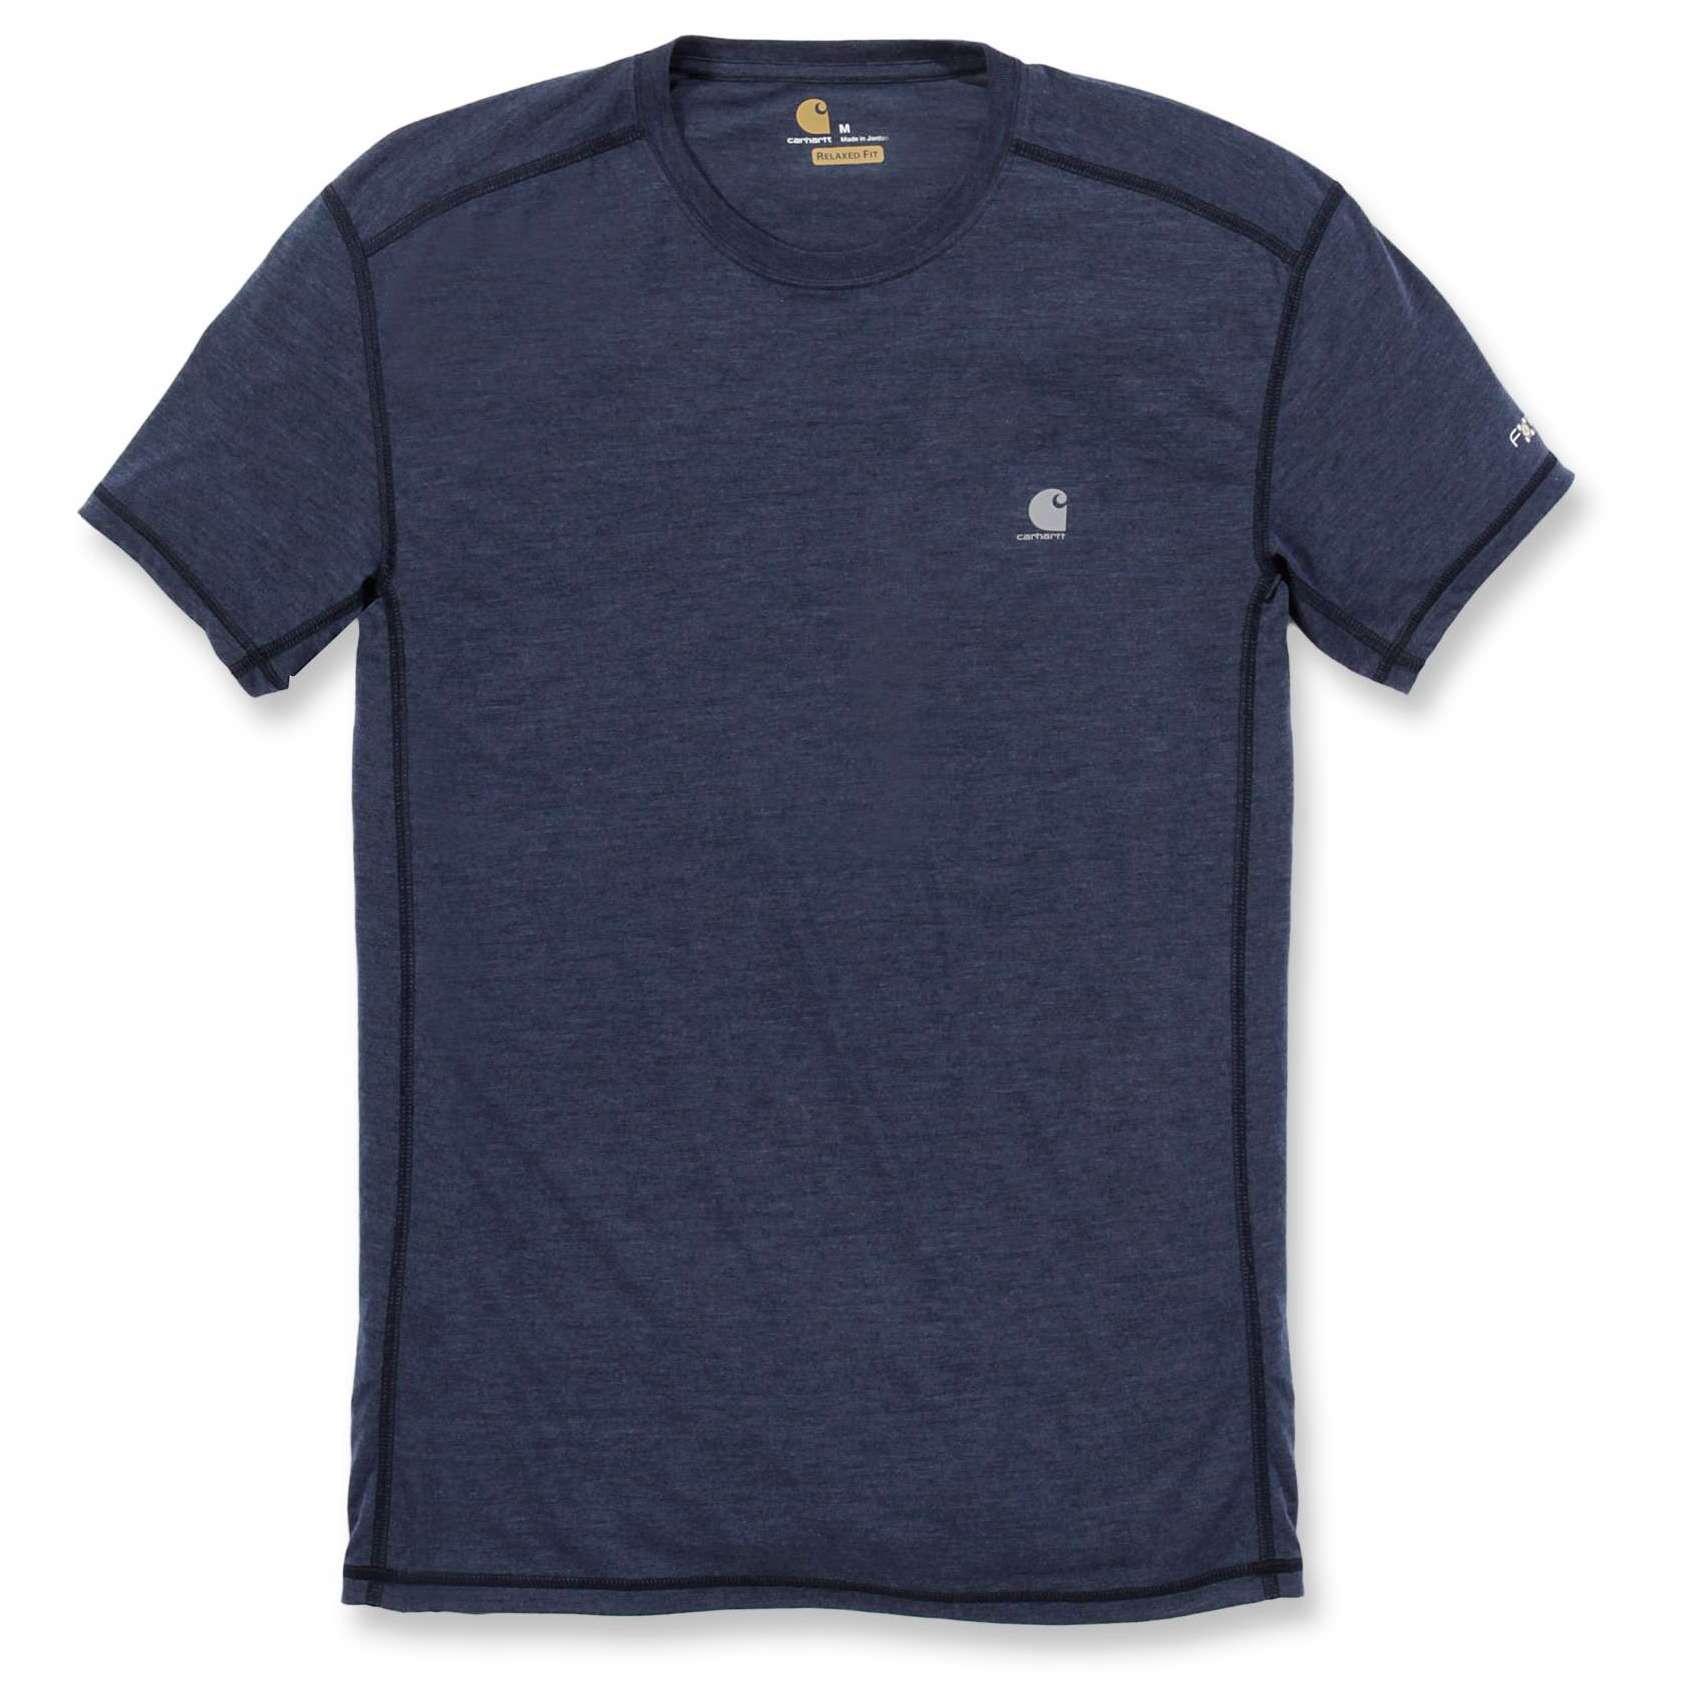 Футболка Carhartt Force Extremes T-Shirt S/S - 102960 (Navy Heather; M)